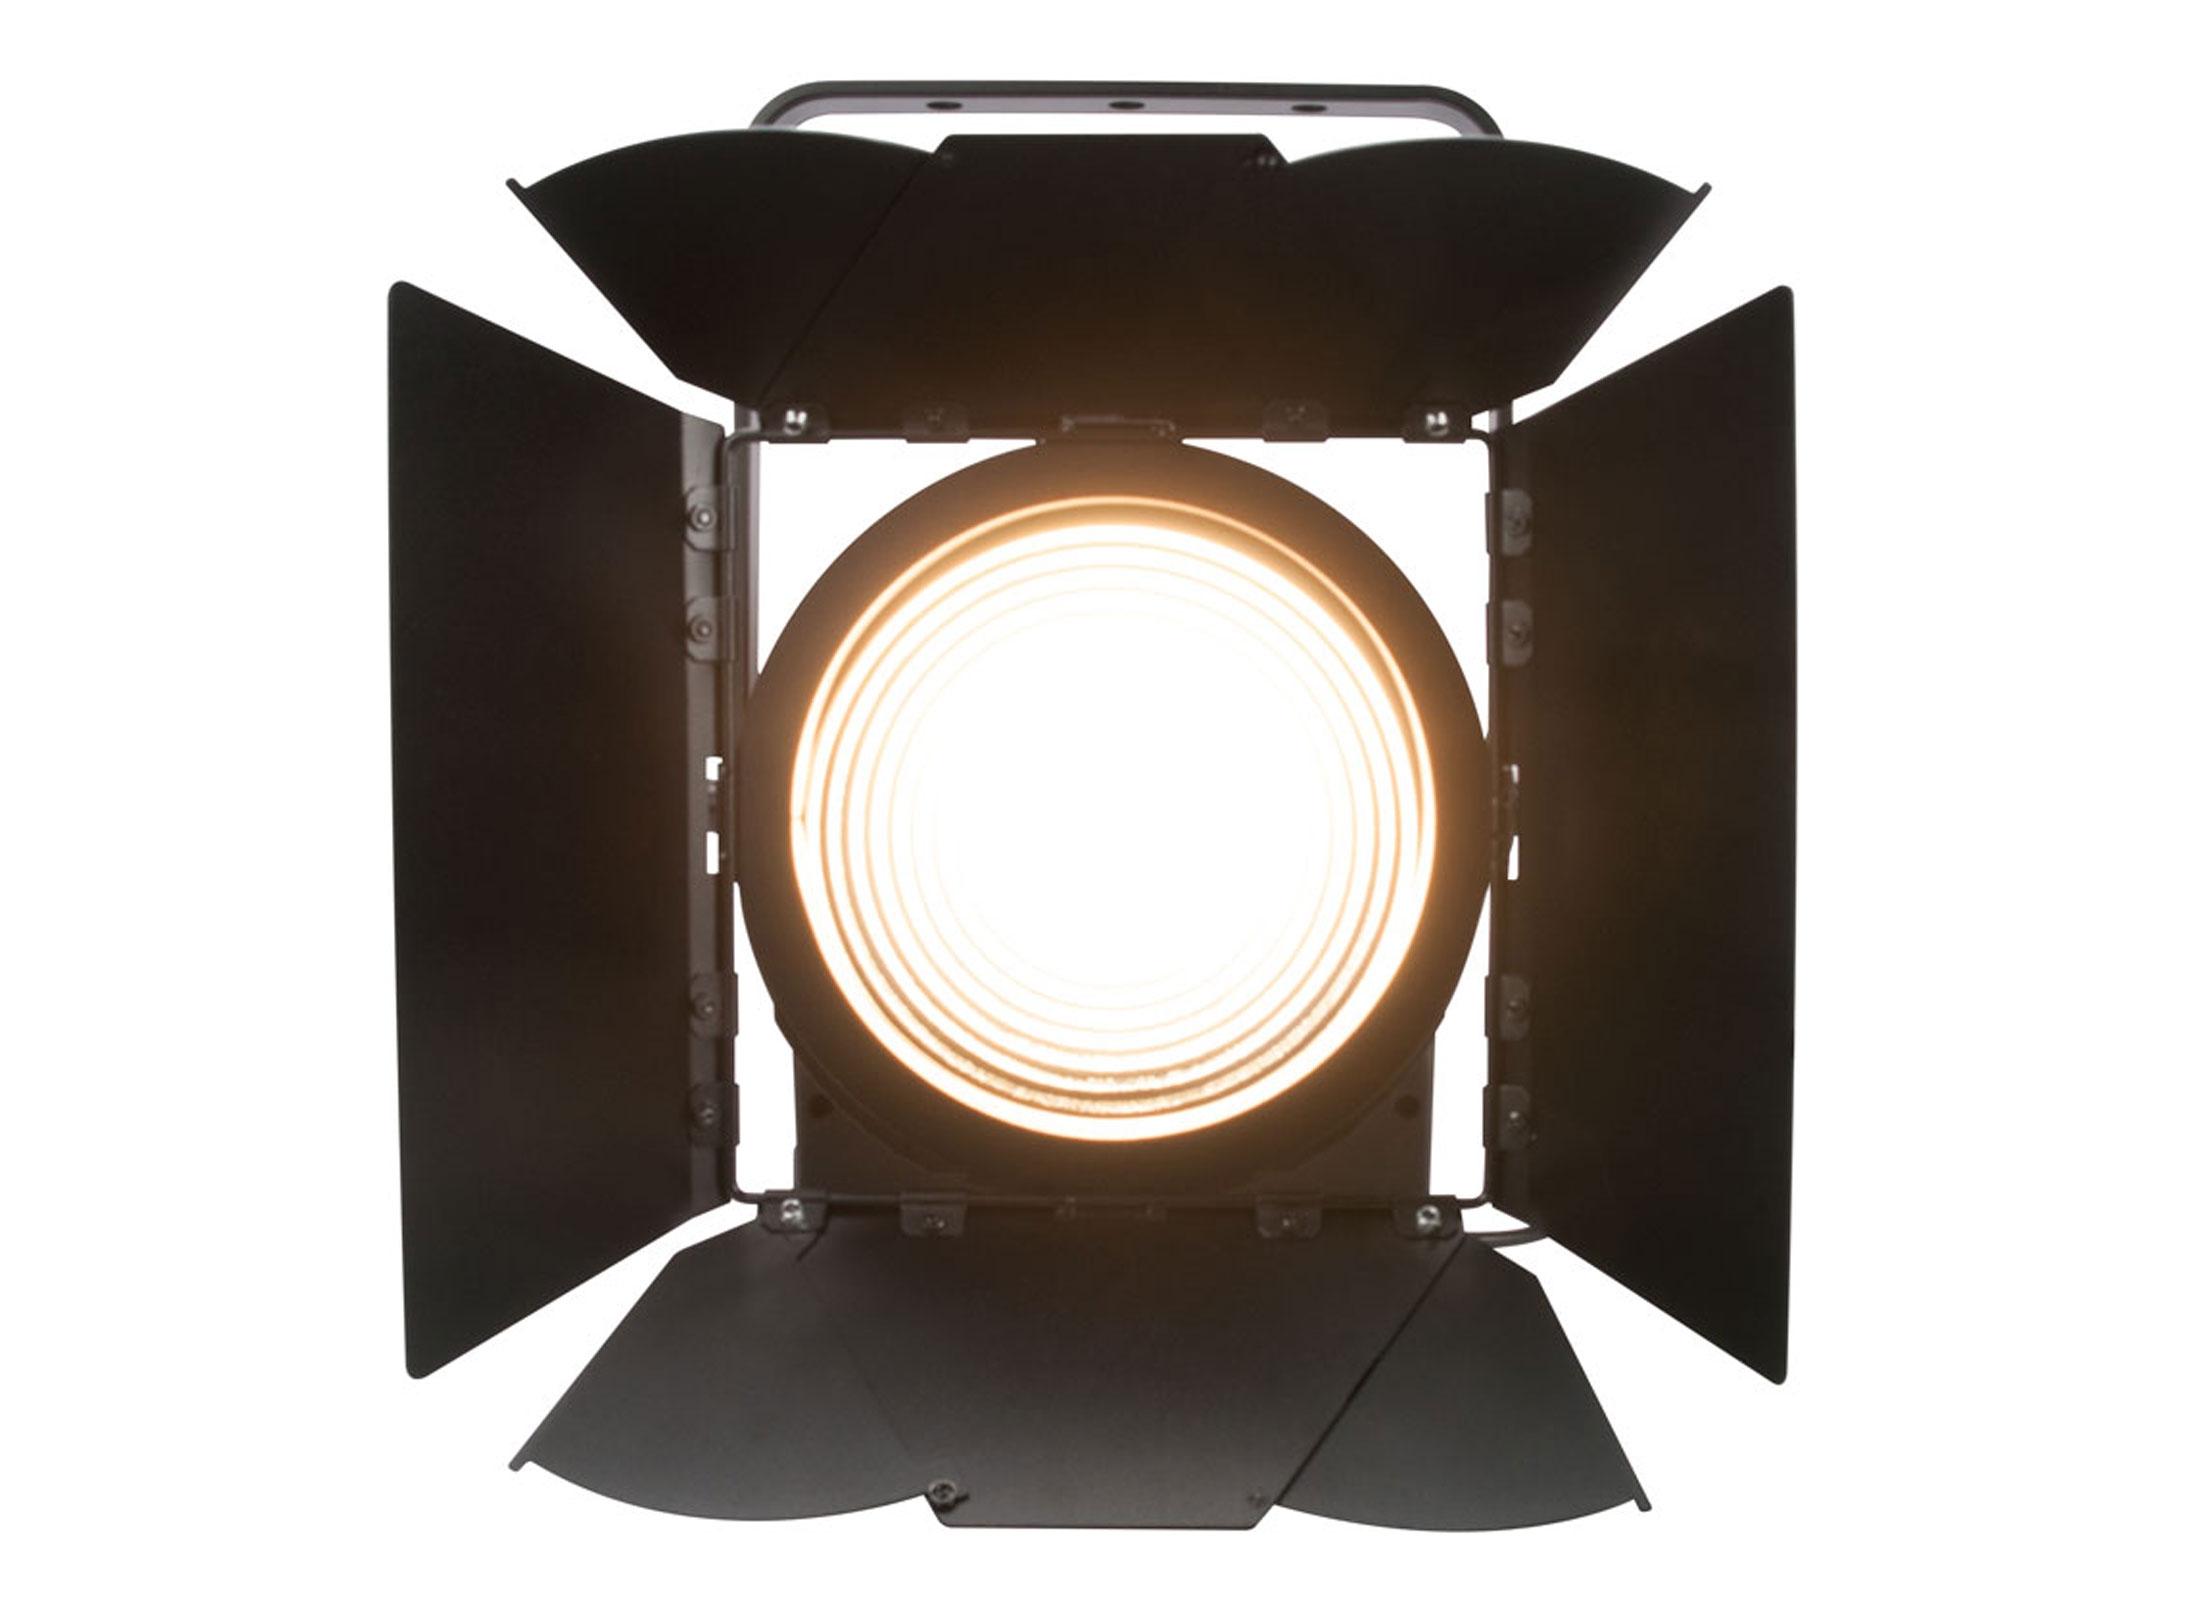 Dimmer Für Led Len elation kl fresnel 8 led lens spotlight at low prices at huss